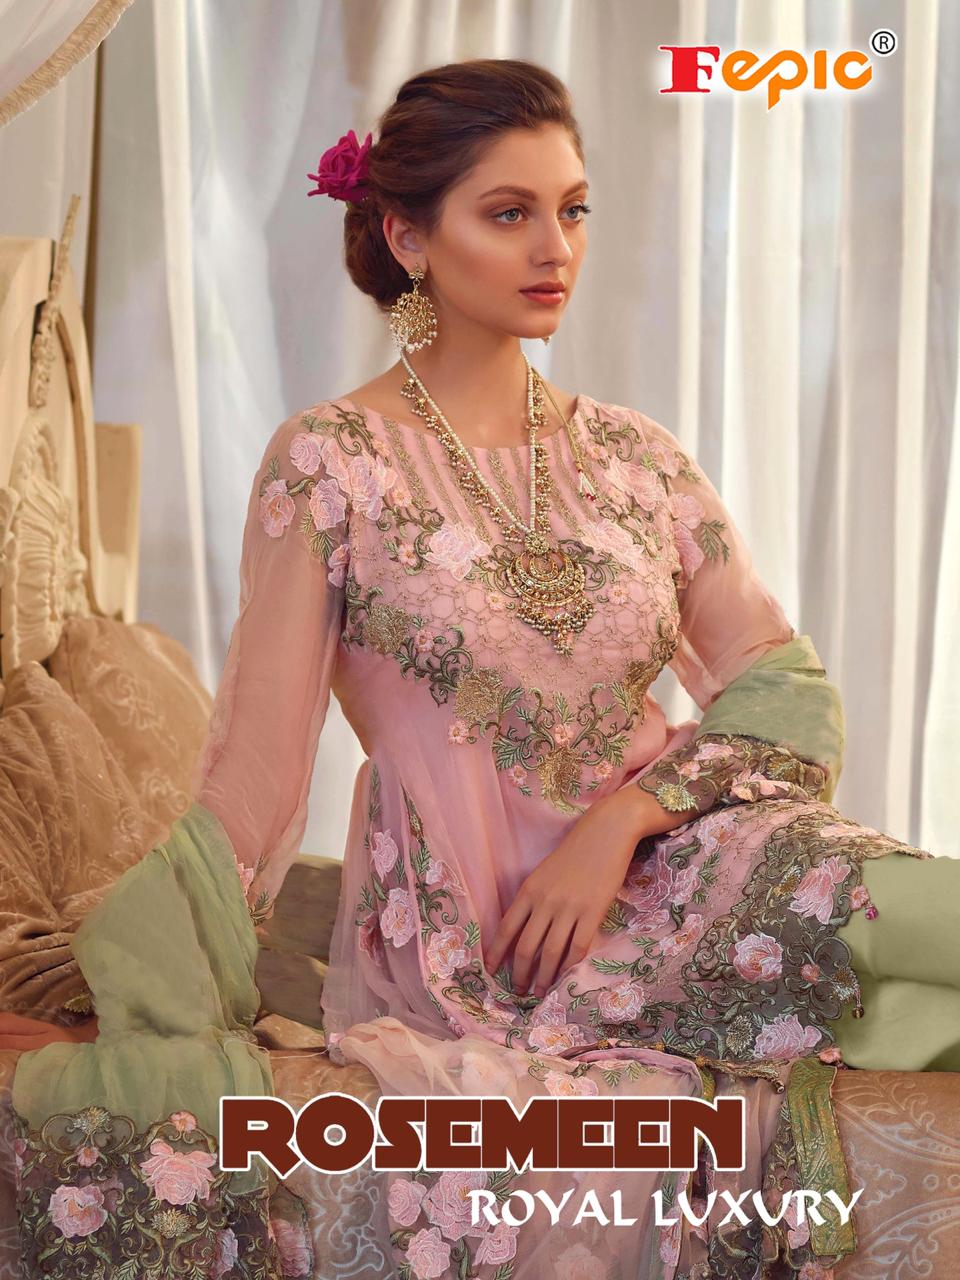 fepic rosemeen  royal luxury fancy designer collection of salwaar suits